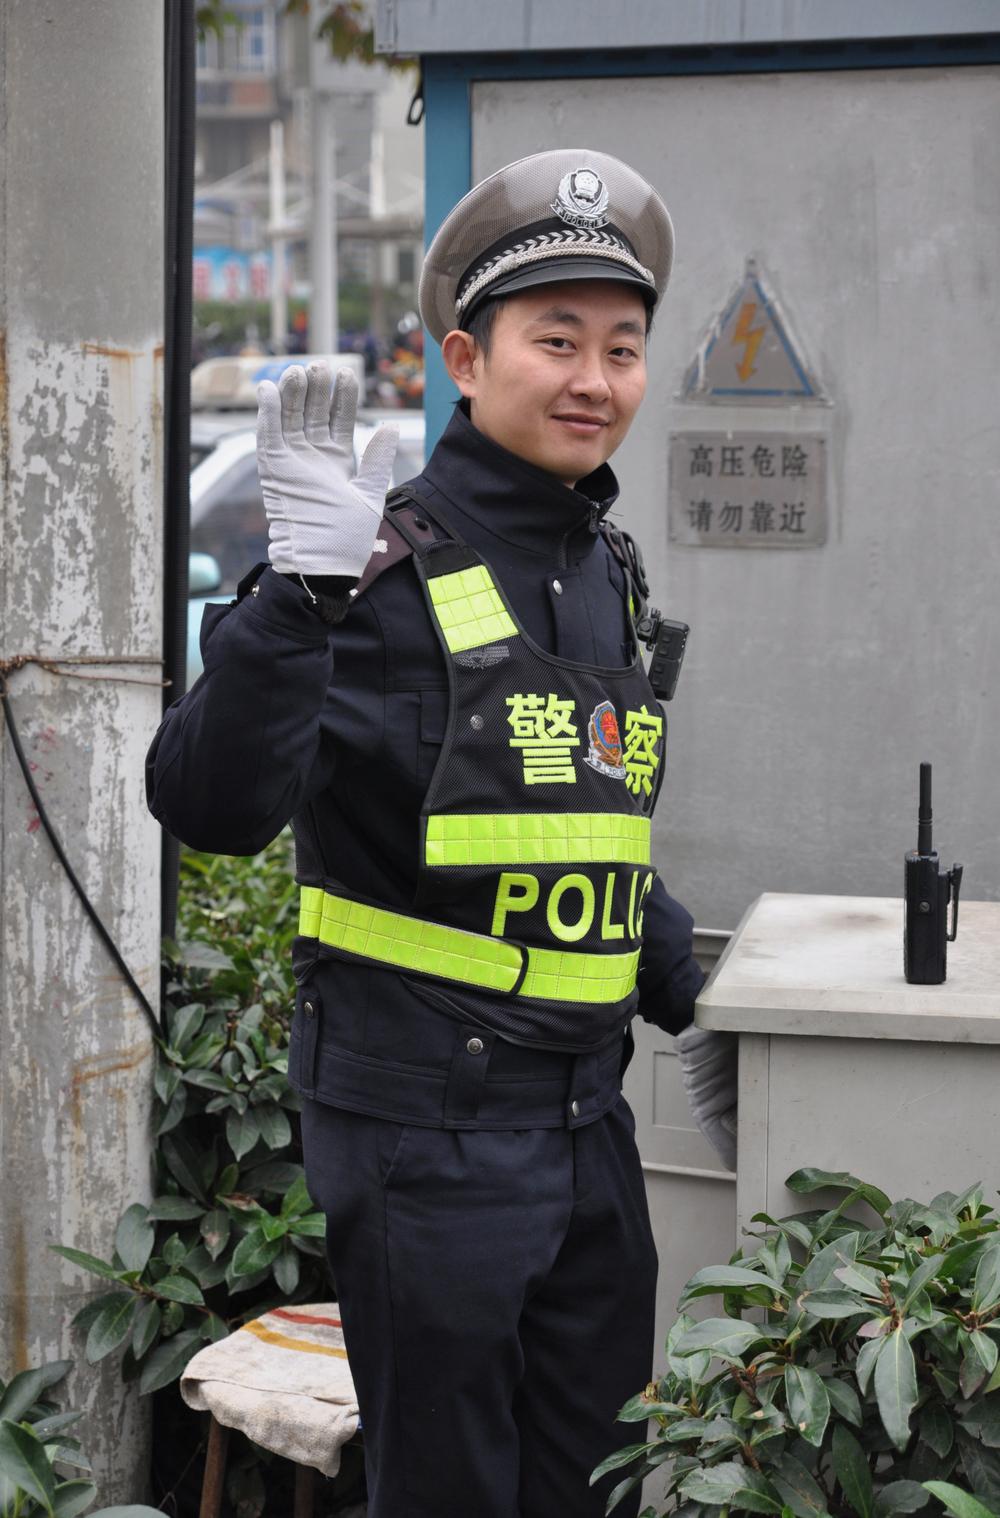 Policeman, Wuhan 2015